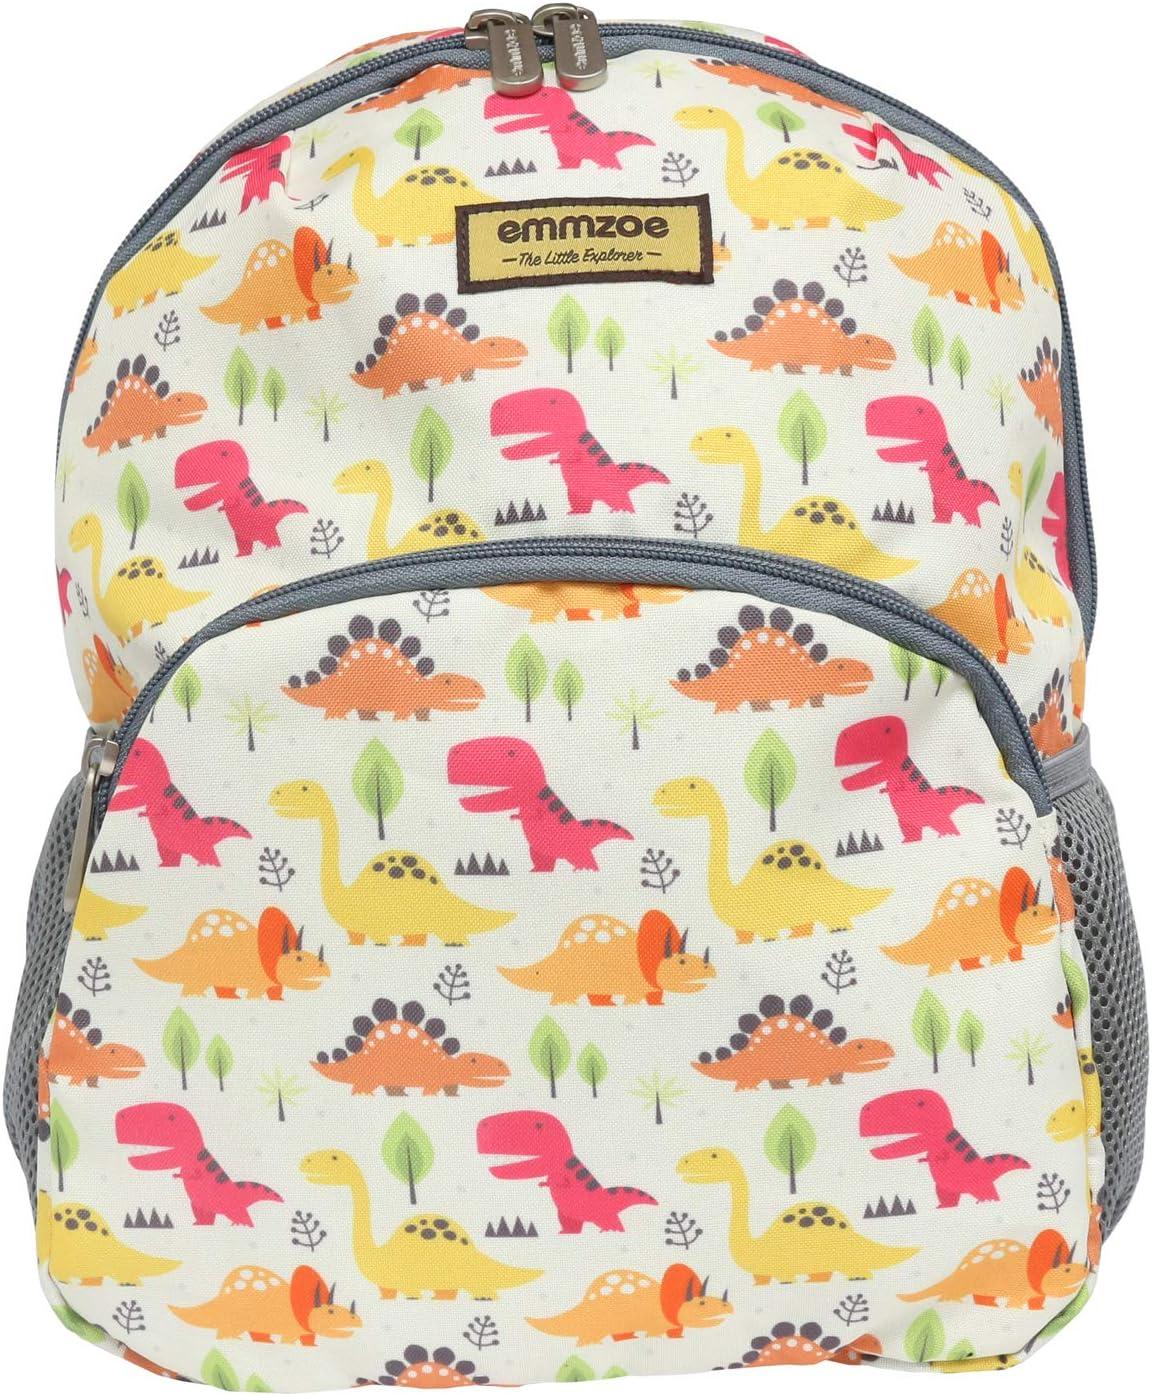 Emmzoe Little Explorer Mini Toddler & Kids Backpack - Lightweight Fits Lunch, Table, Food, Books (Dinosaurs)